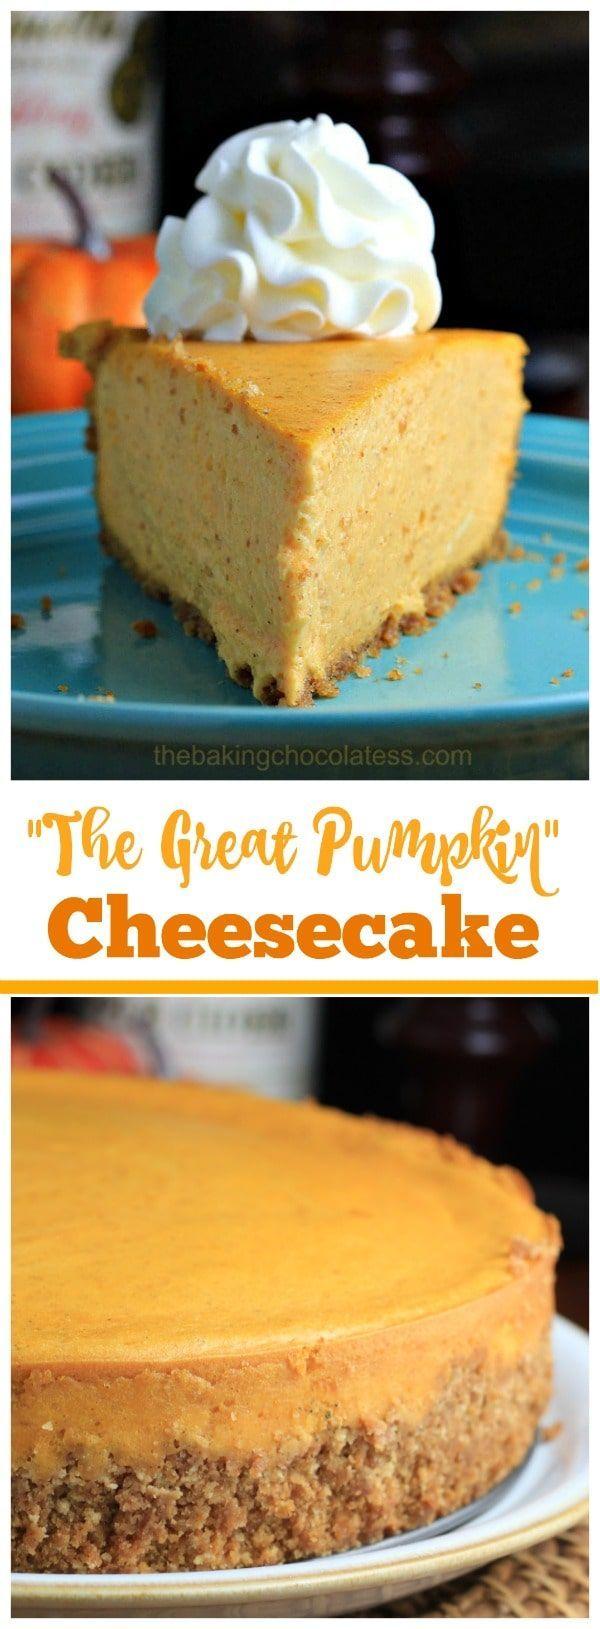 Best 25+ The great pumpkin patch ideas on Pinterest ...